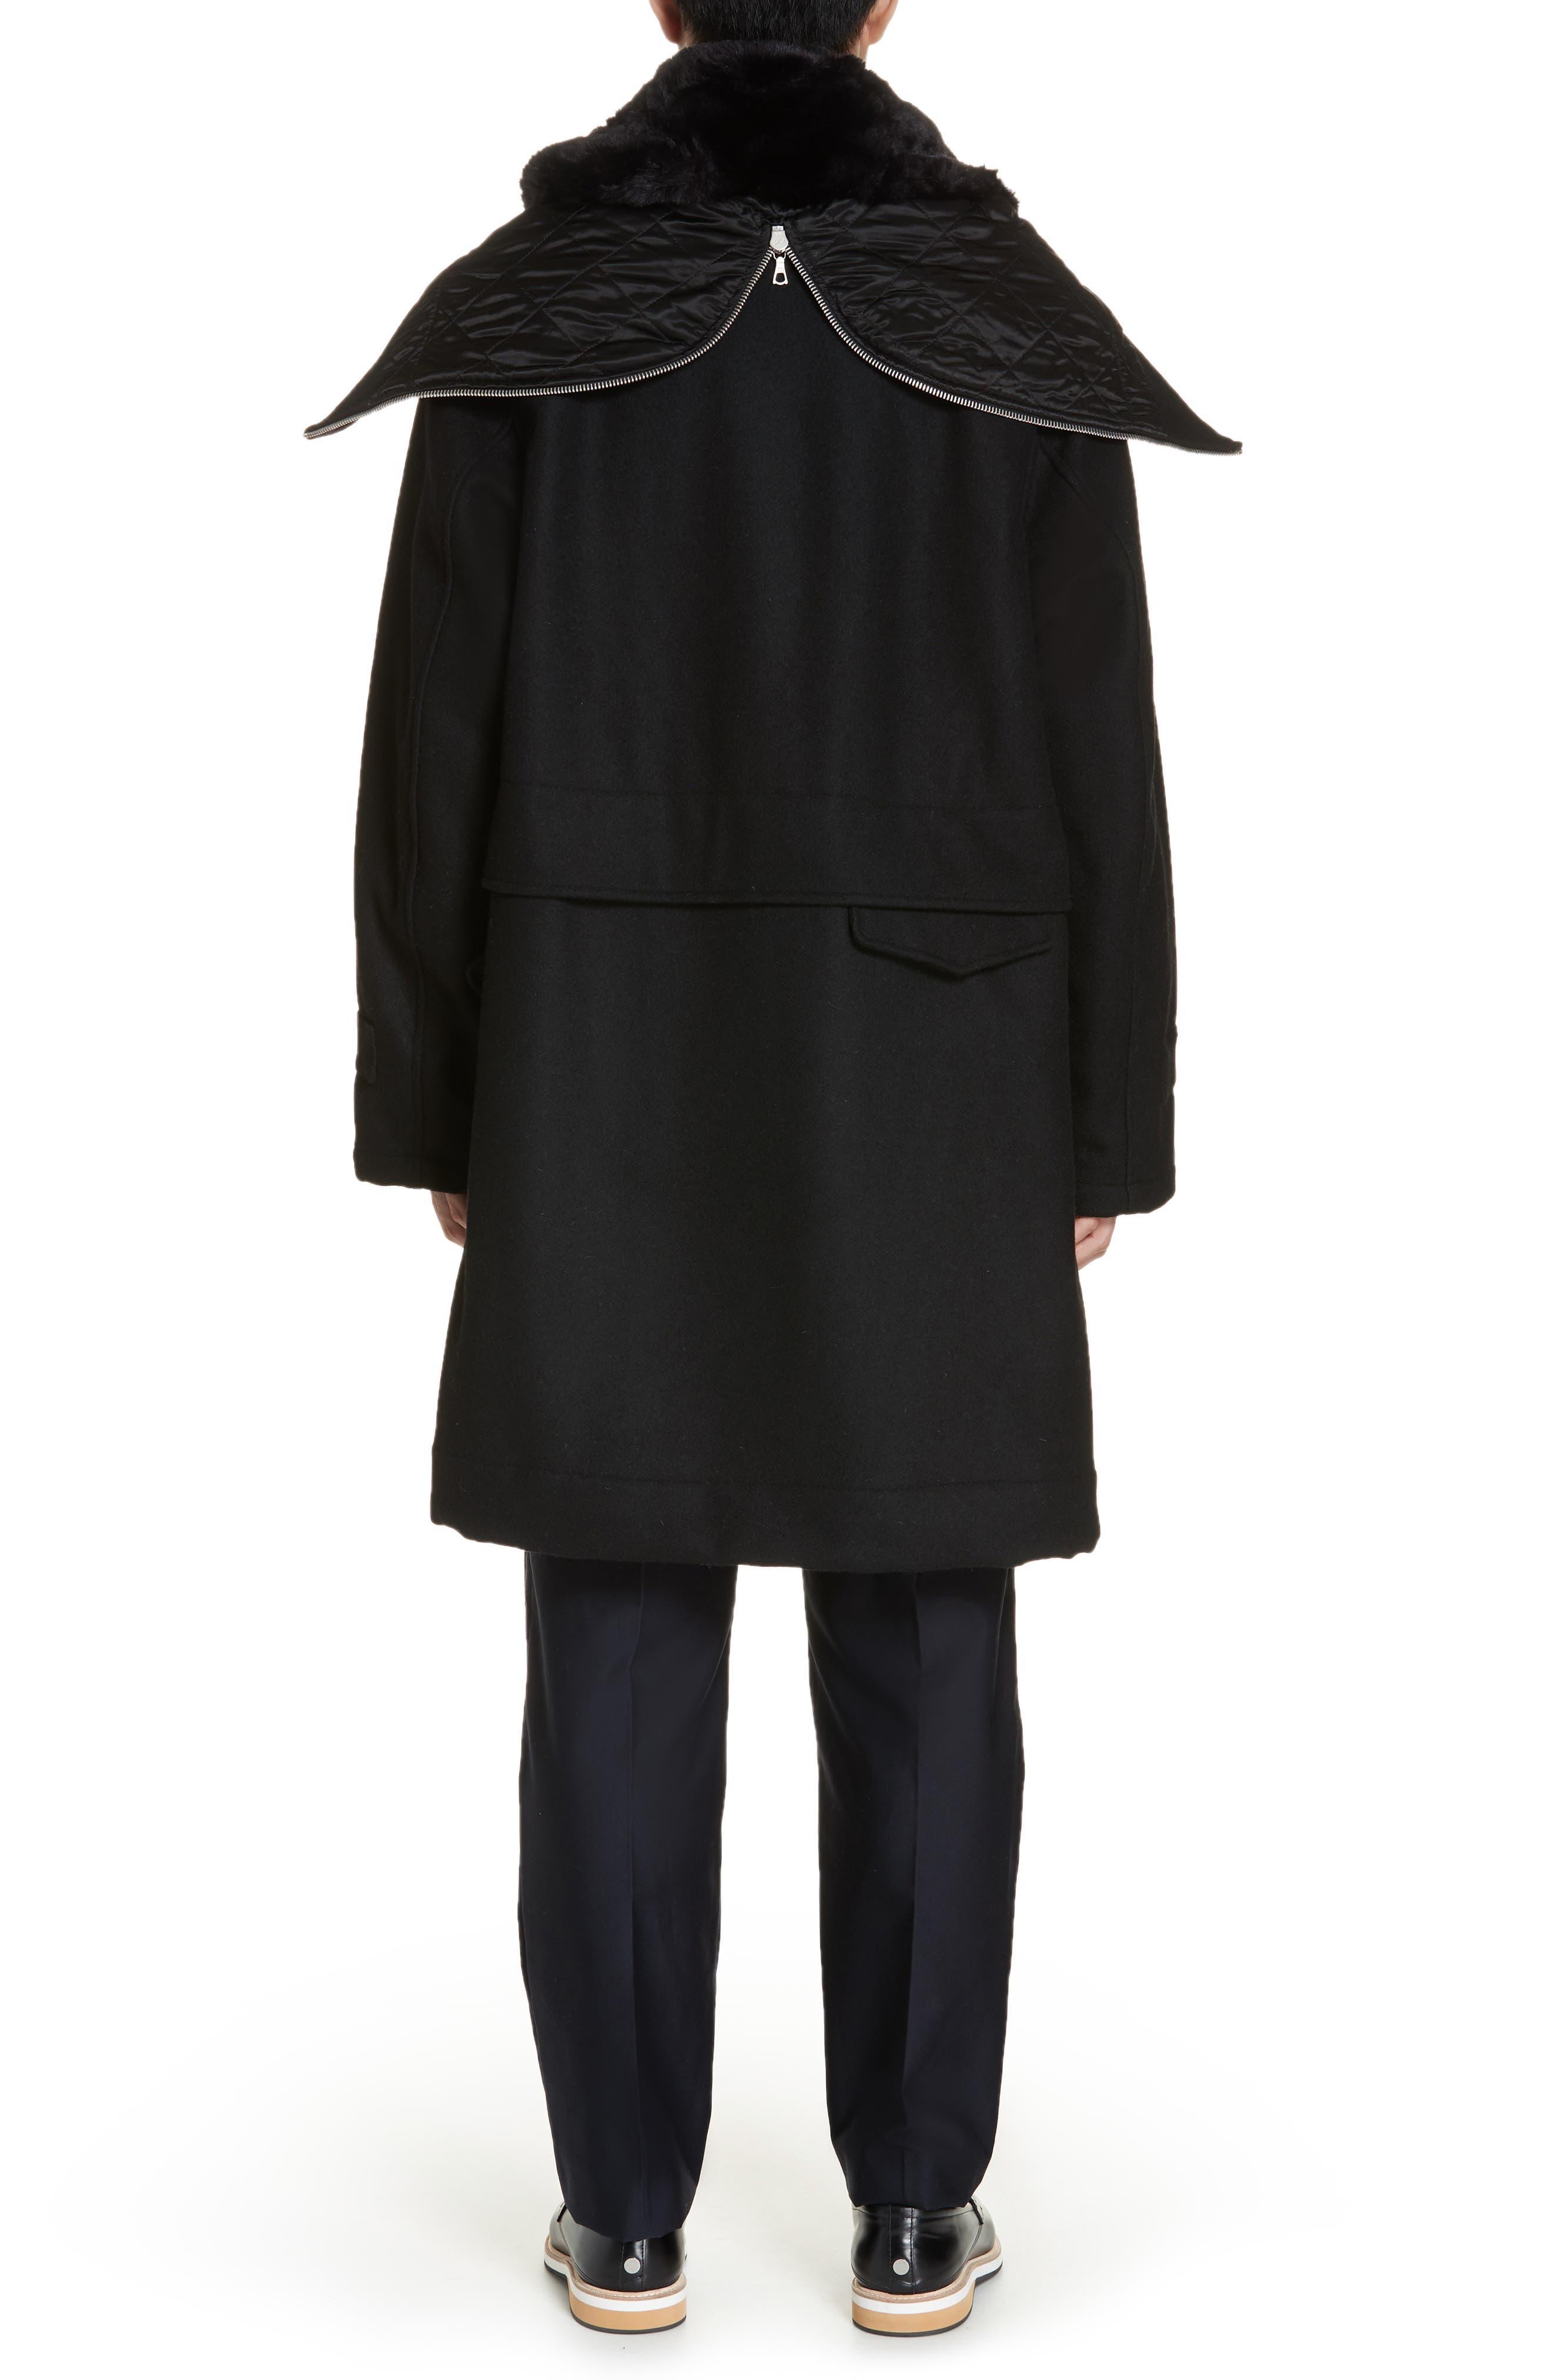 Verreli Hooded Parka with Faux Fur Trim,                             Alternate thumbnail 3, color,                             BLACK 900